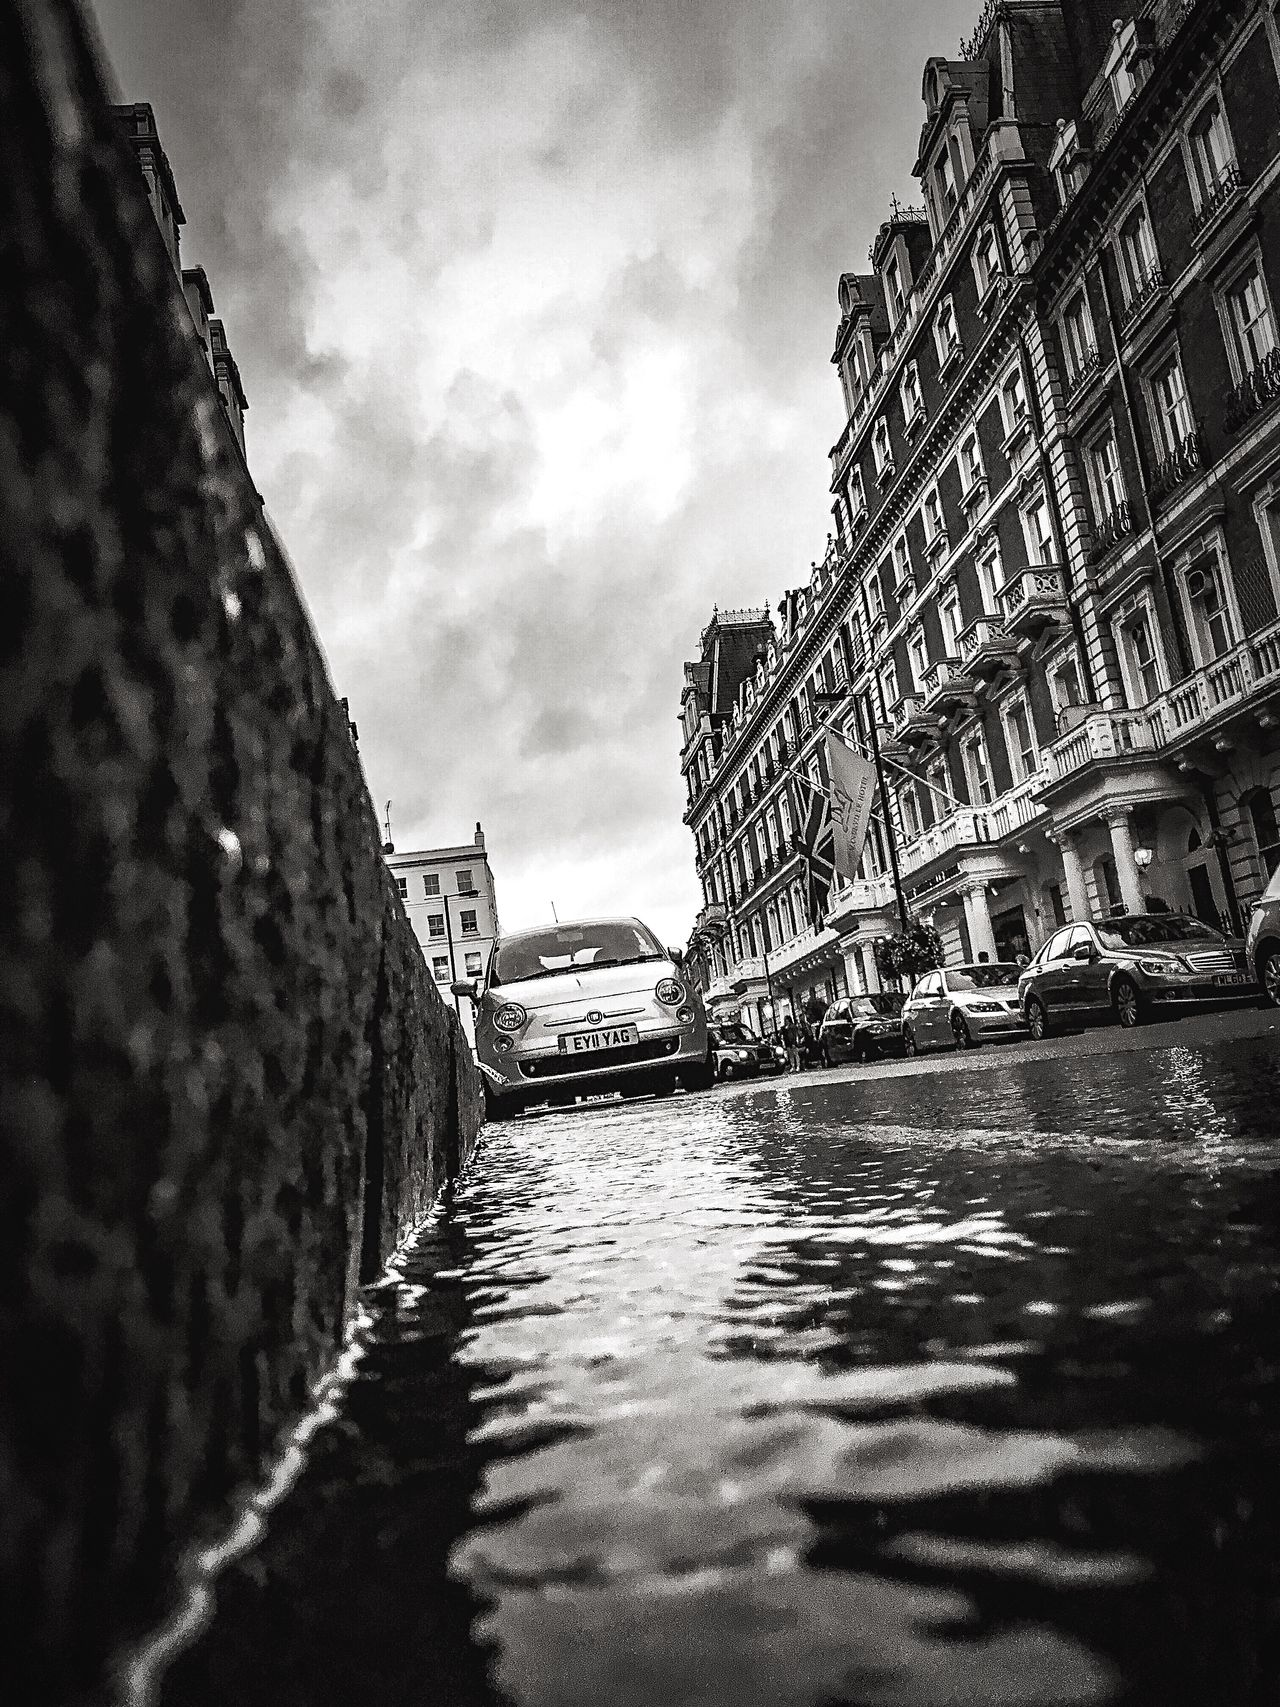 London From The Gutter Series Gutter View Puddles Street Photography Fine Art Photography Blackandwhite Urban Exploration Buildings & Sky EyeEm Best Shots Darkness Fine Art Artistic